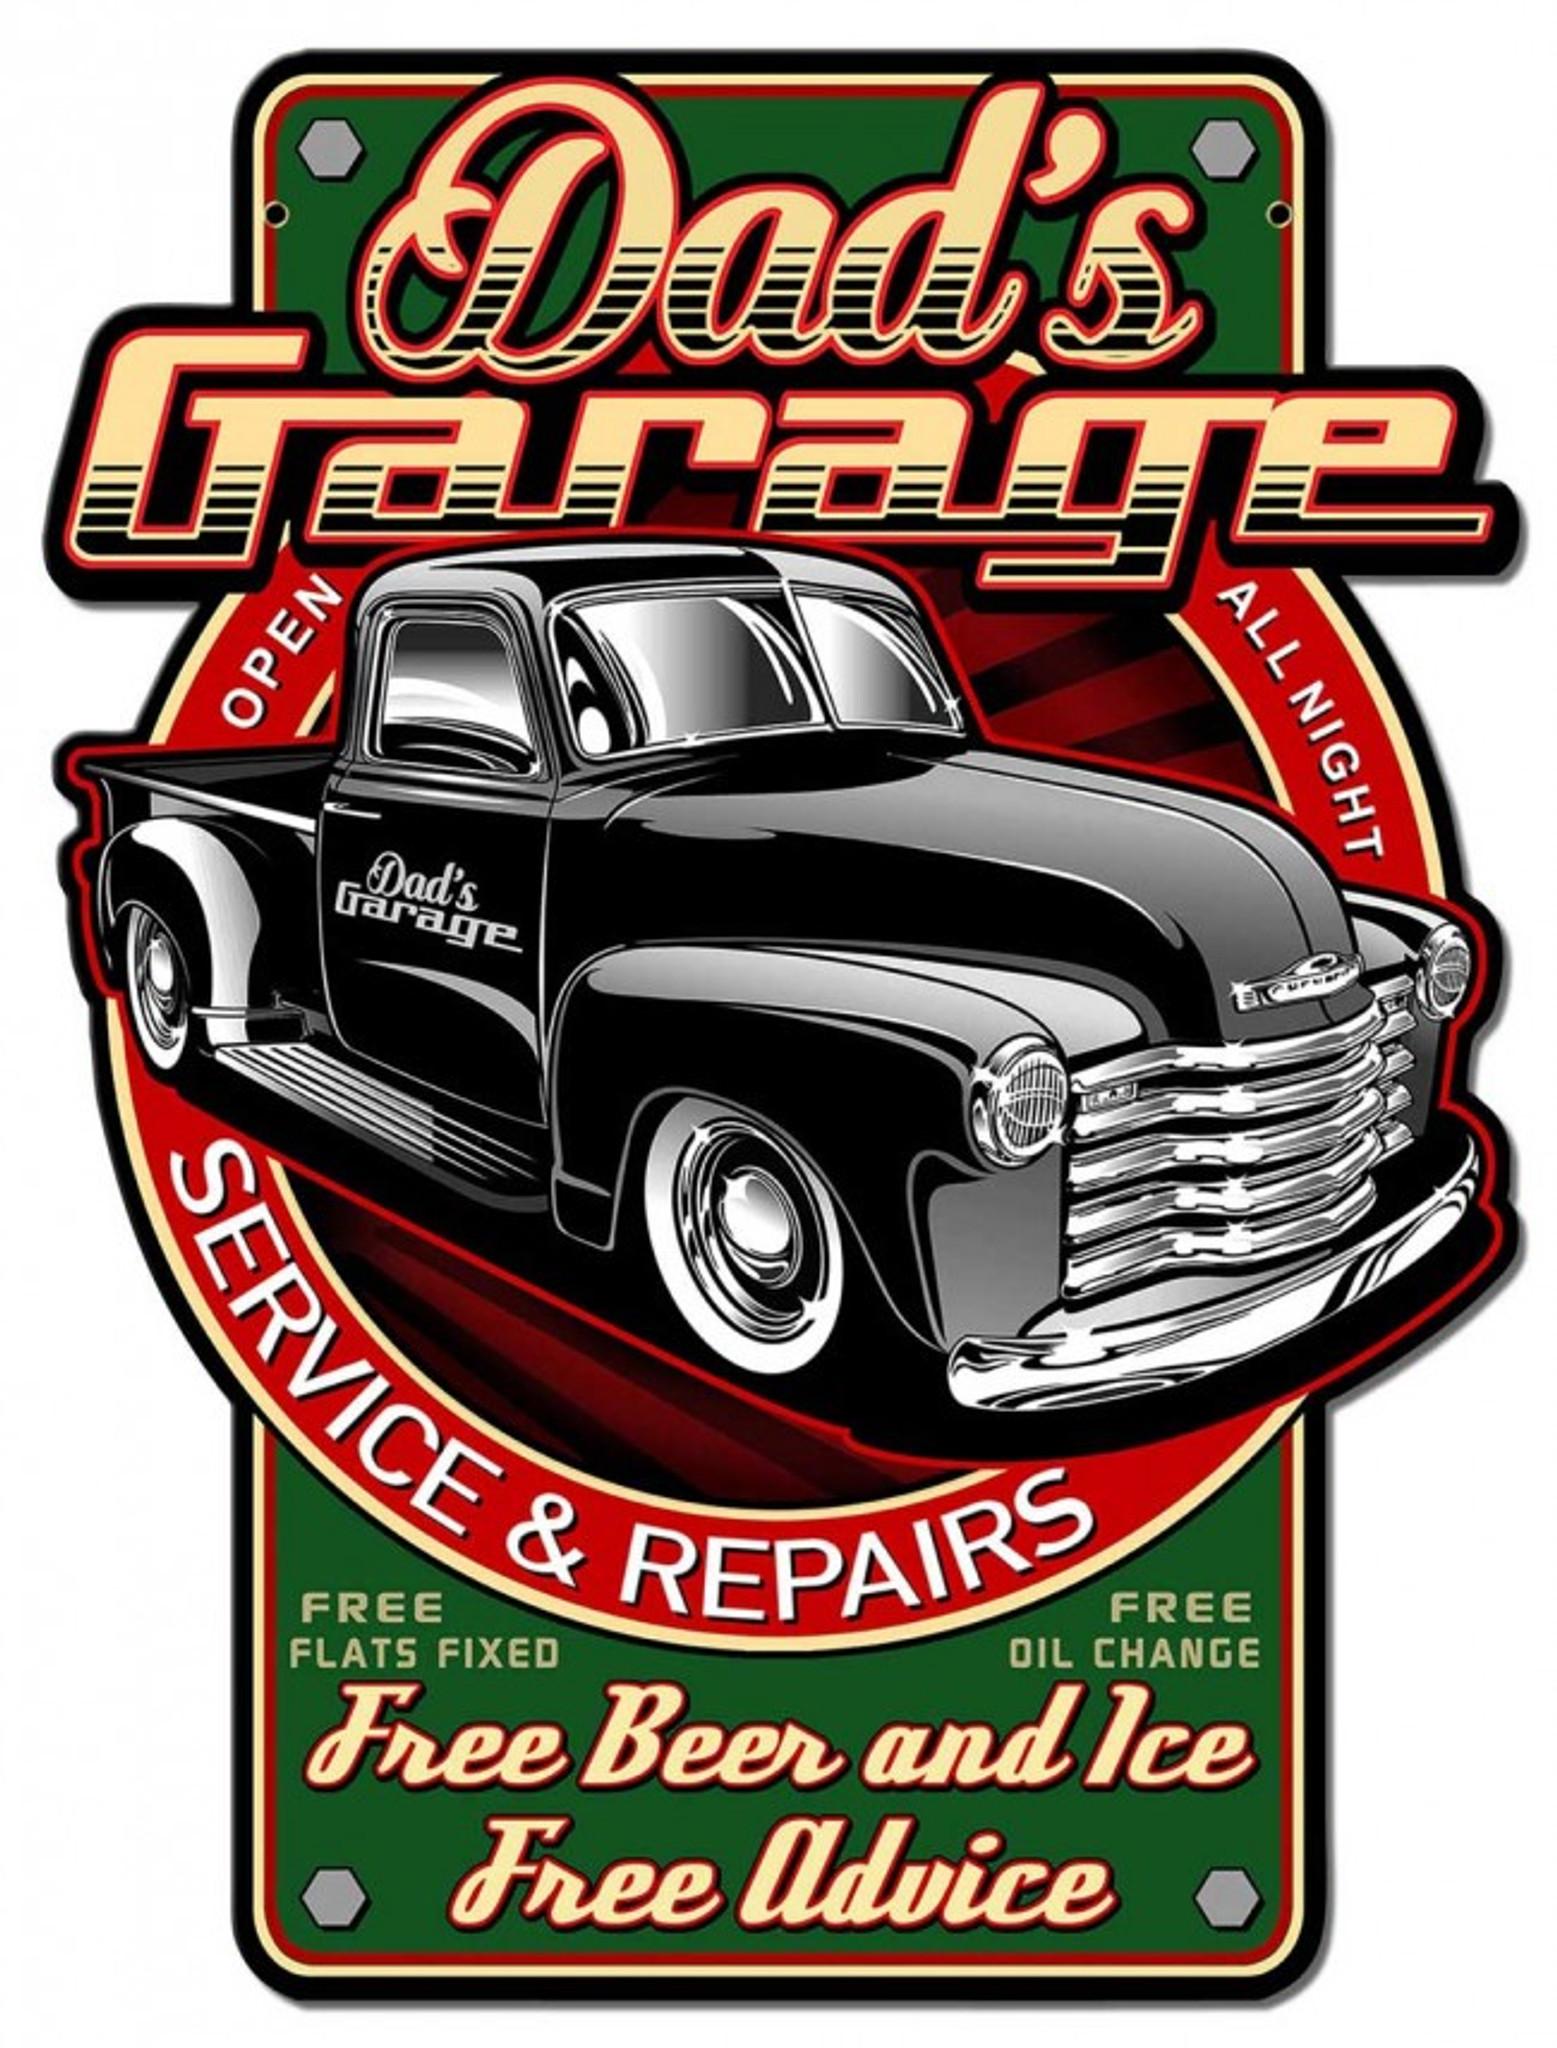 "Nostalgic Dads Garage Open Full Service 24 hrs  Aluminum Metal Sign 12/"""